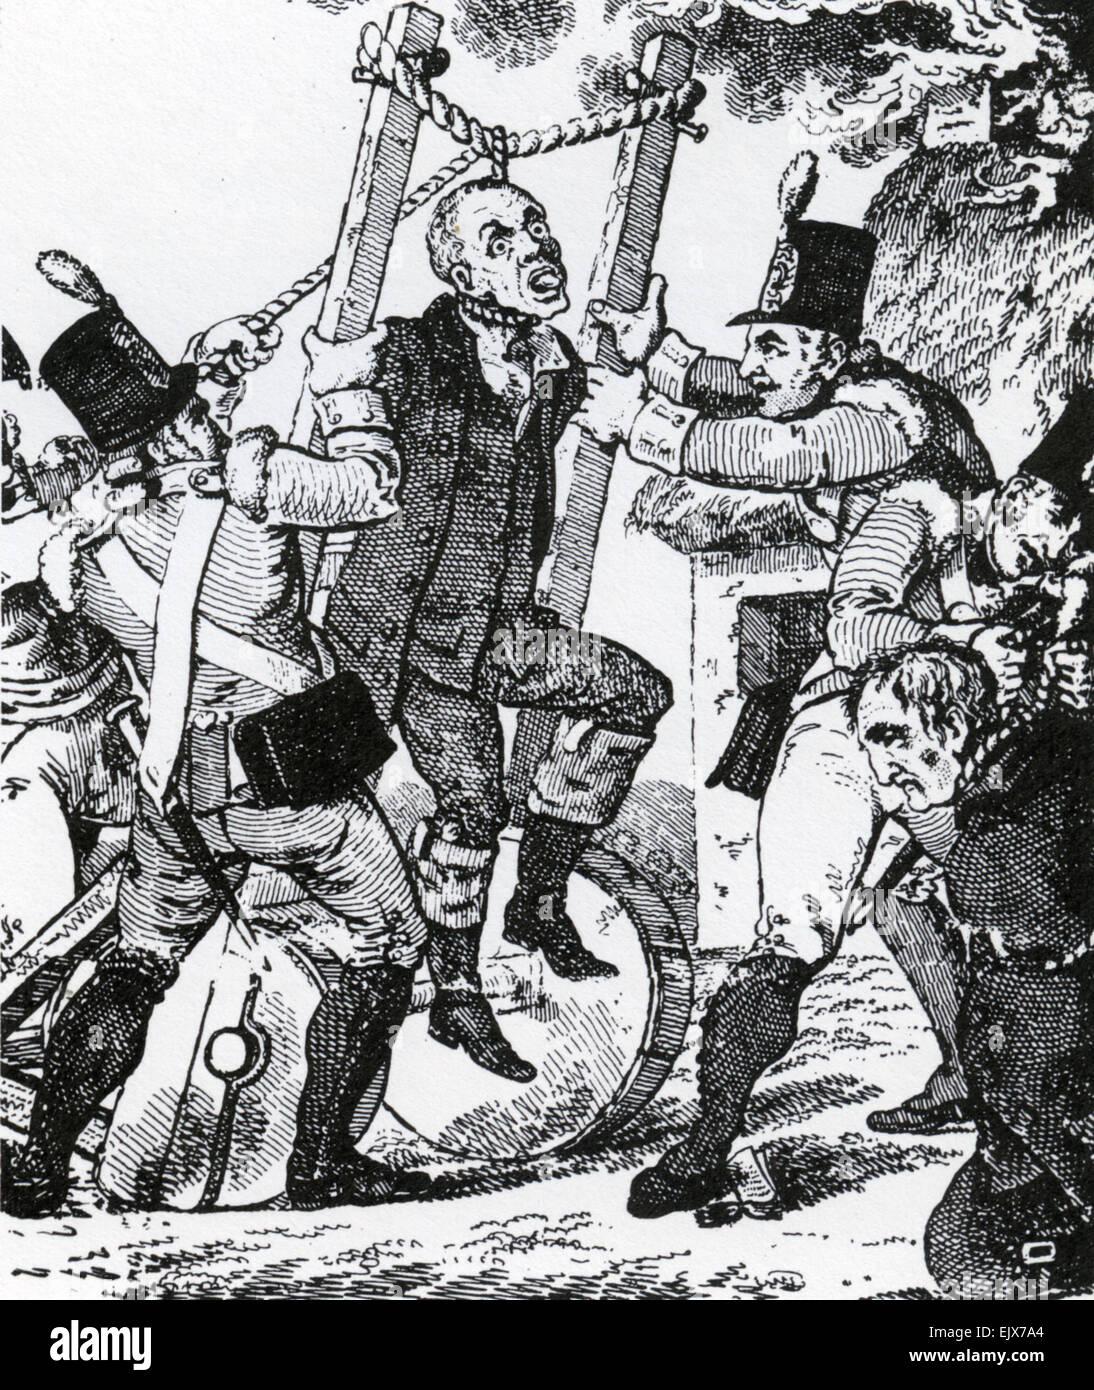 The 1798 irish rebellion essay